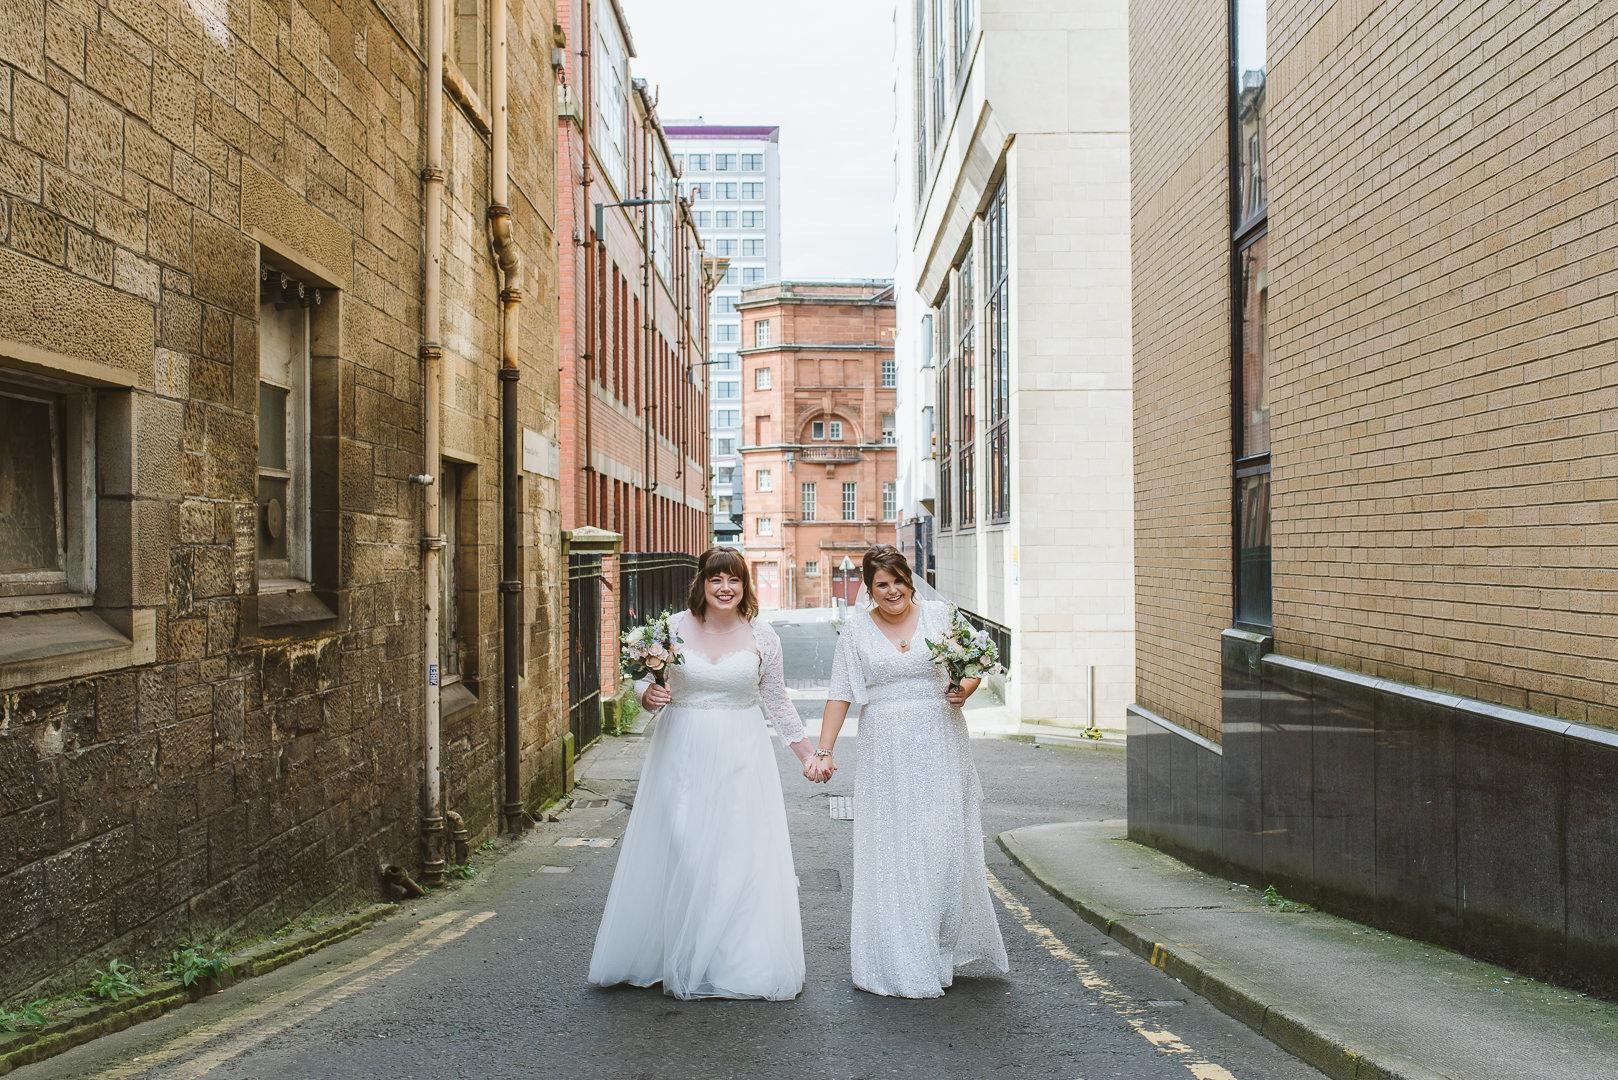 Same Sex Wedding Glasgow - From my best wedding photos from 2019